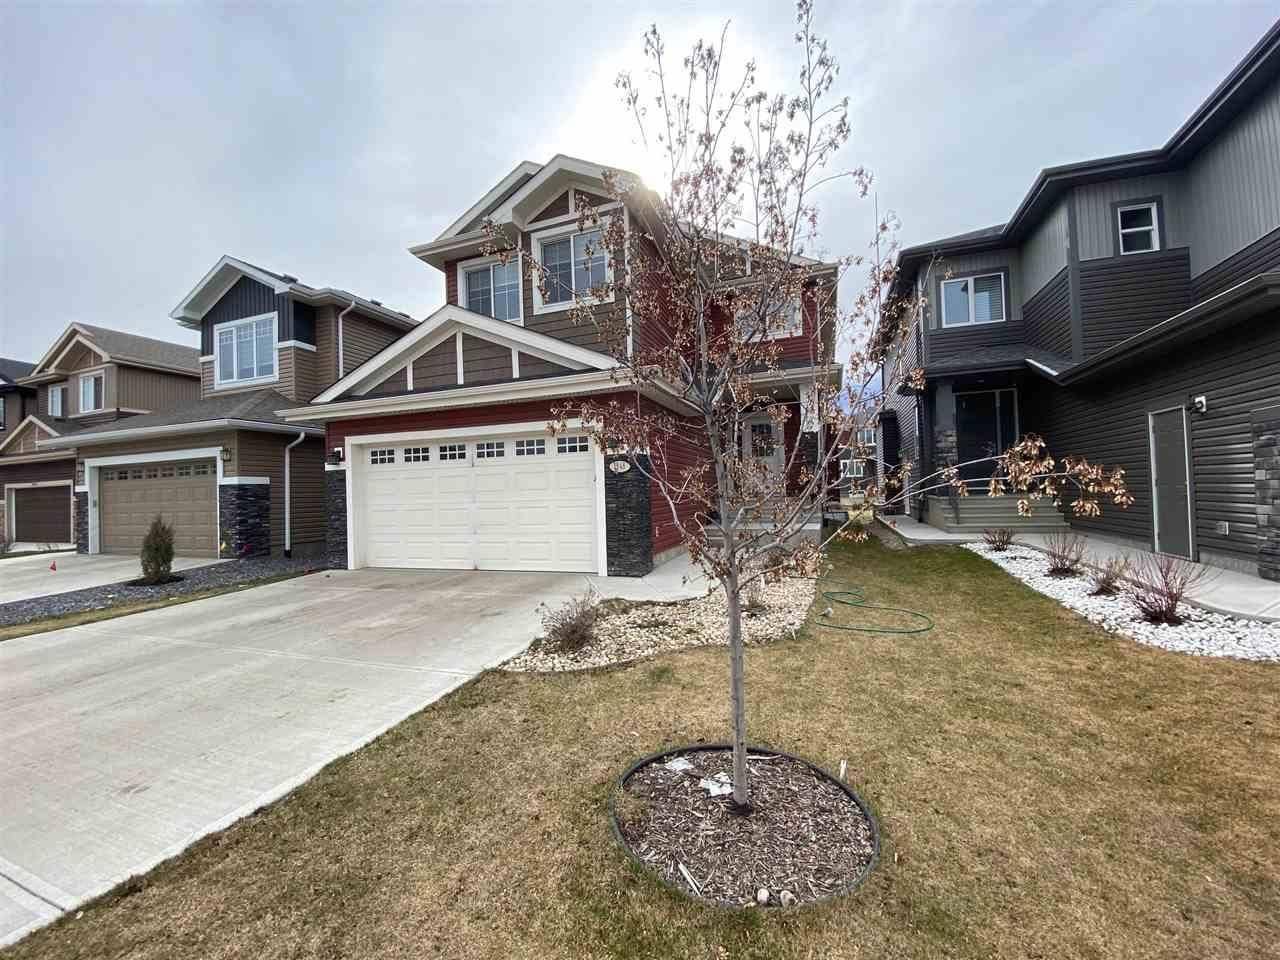 House for sale at 1948 Adamson Te Sw Edmonton Alberta - MLS: E4195489